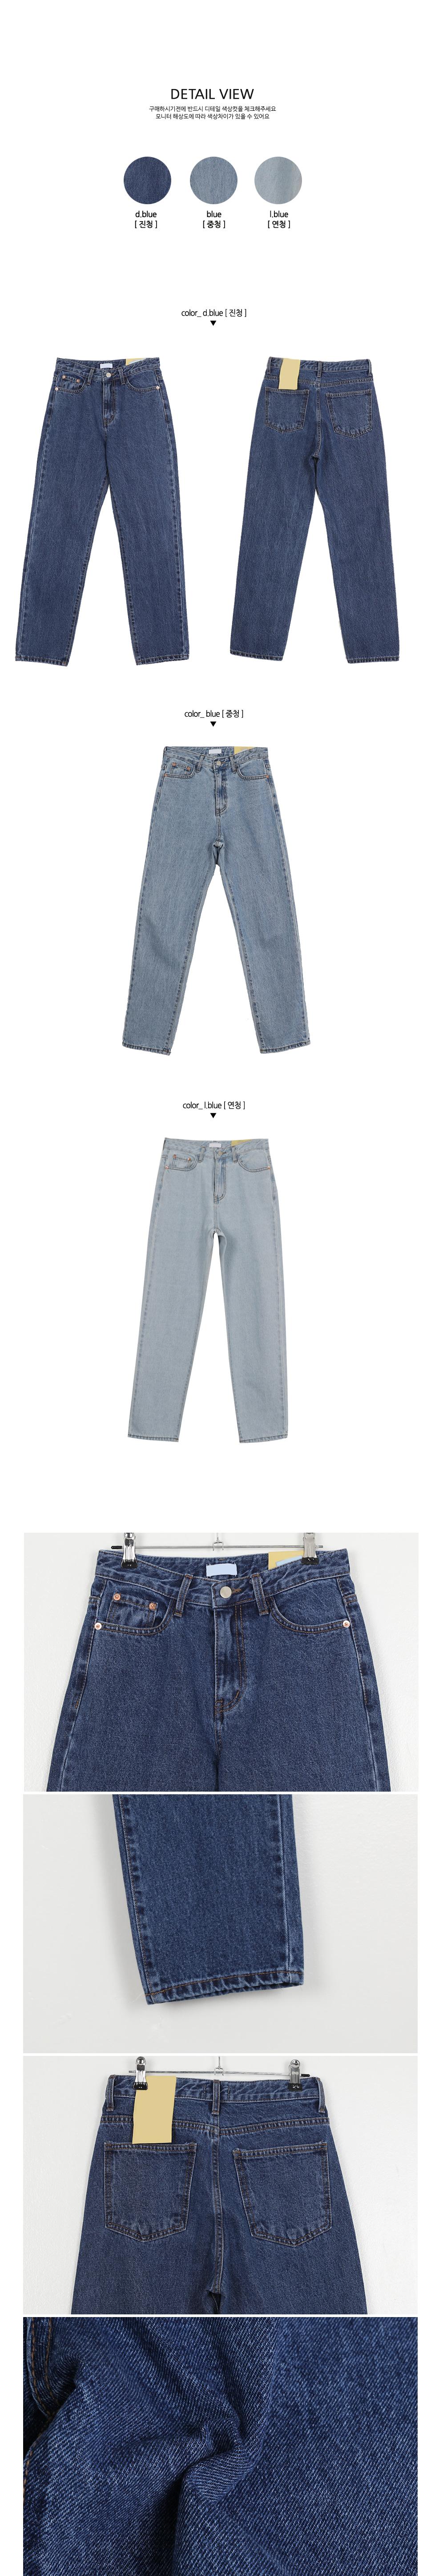 Bigfleed denim pants